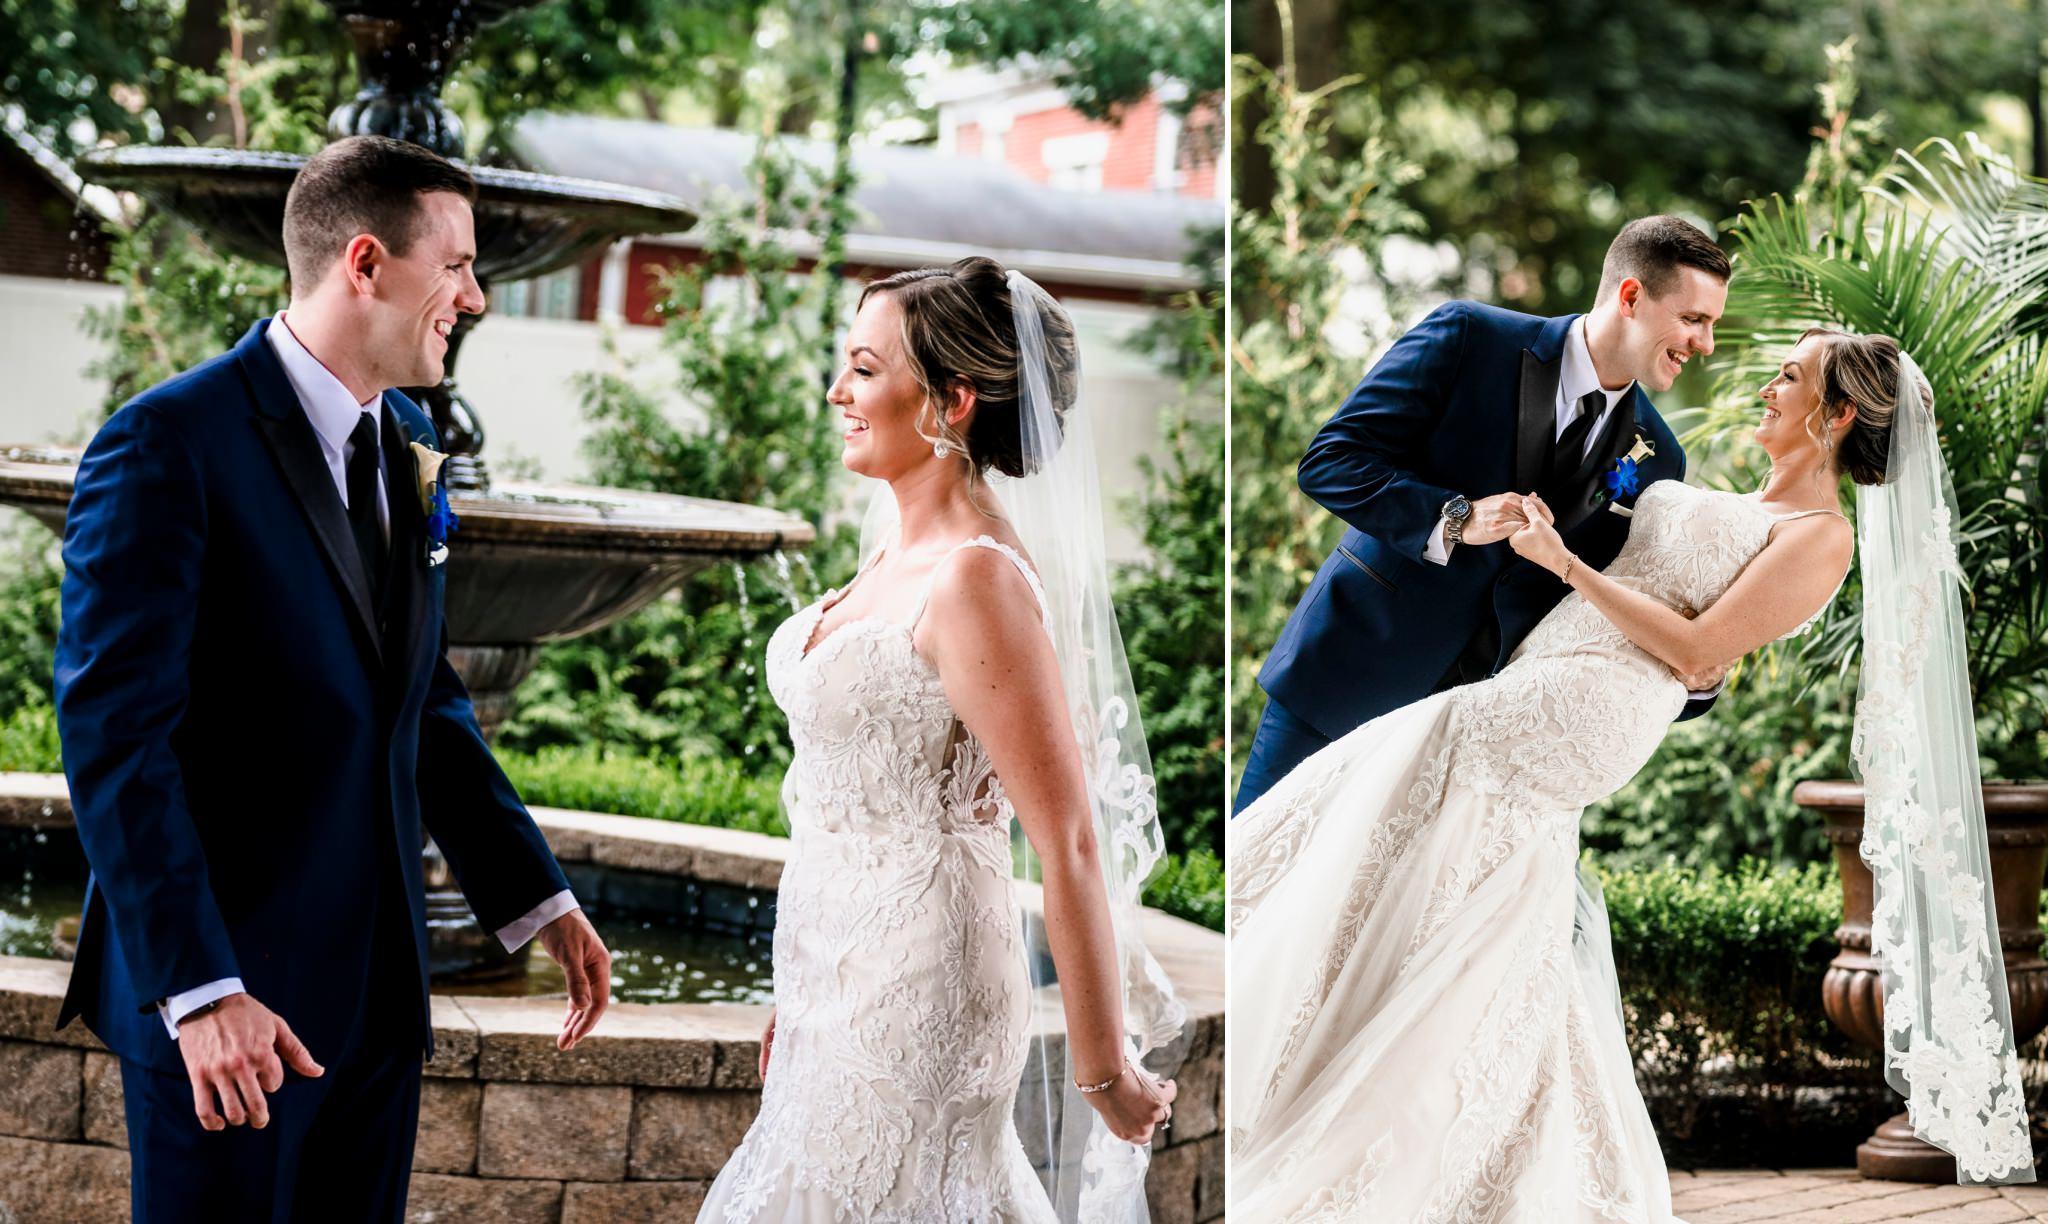 Brennan-South-Gate-Manor-New-Jersey-Wedding-Photographer-54.JPG